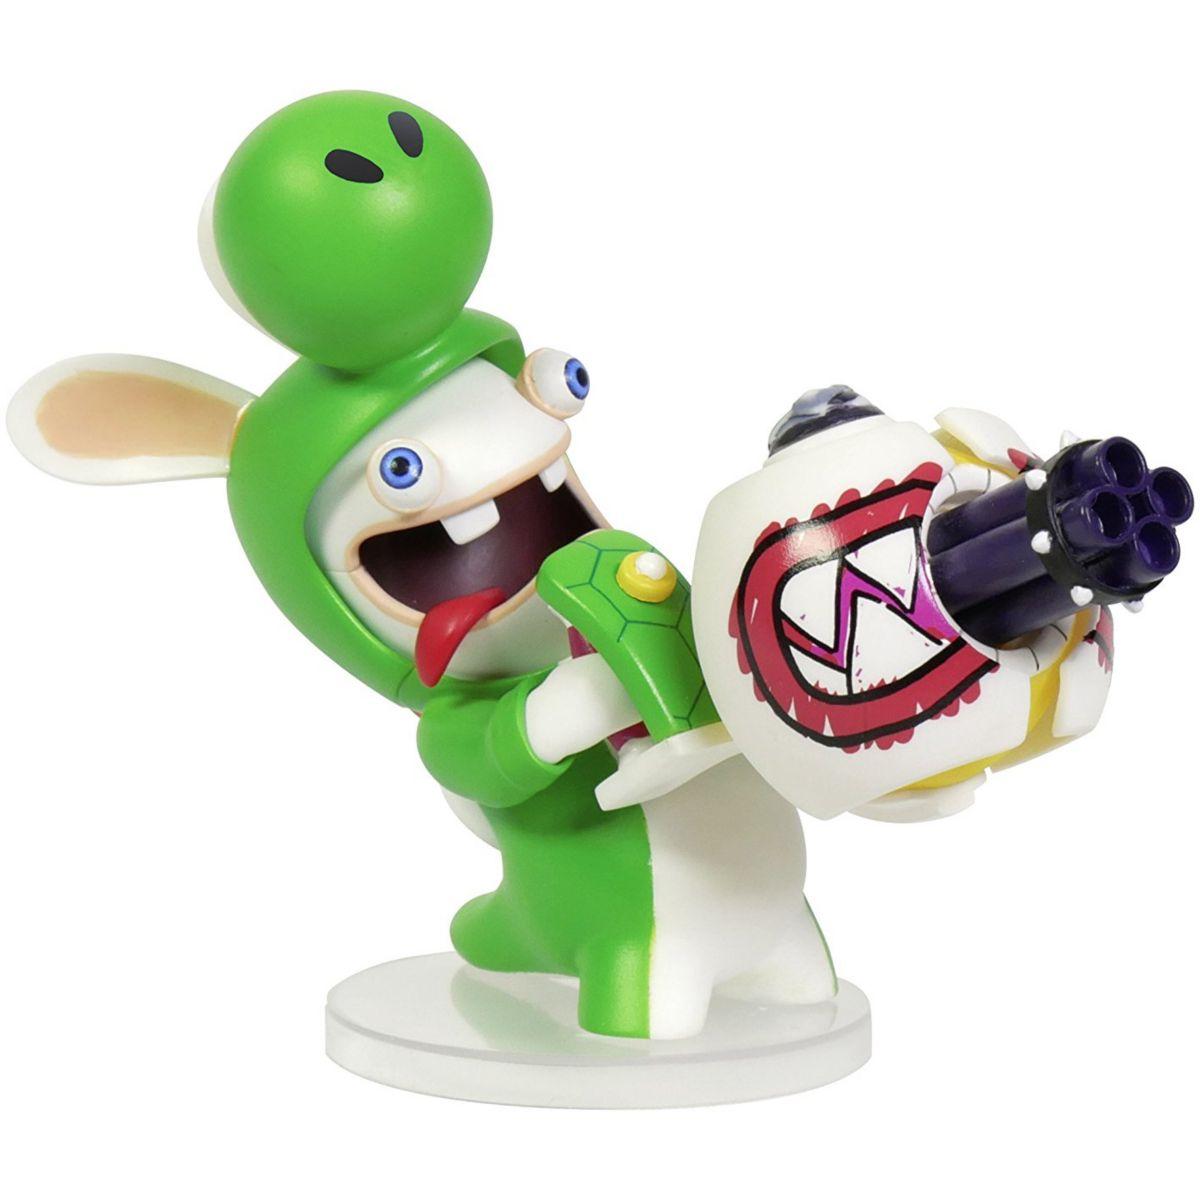 Figurine UBISOFT Mario + Lapins Crétins - Yoshi 8cm